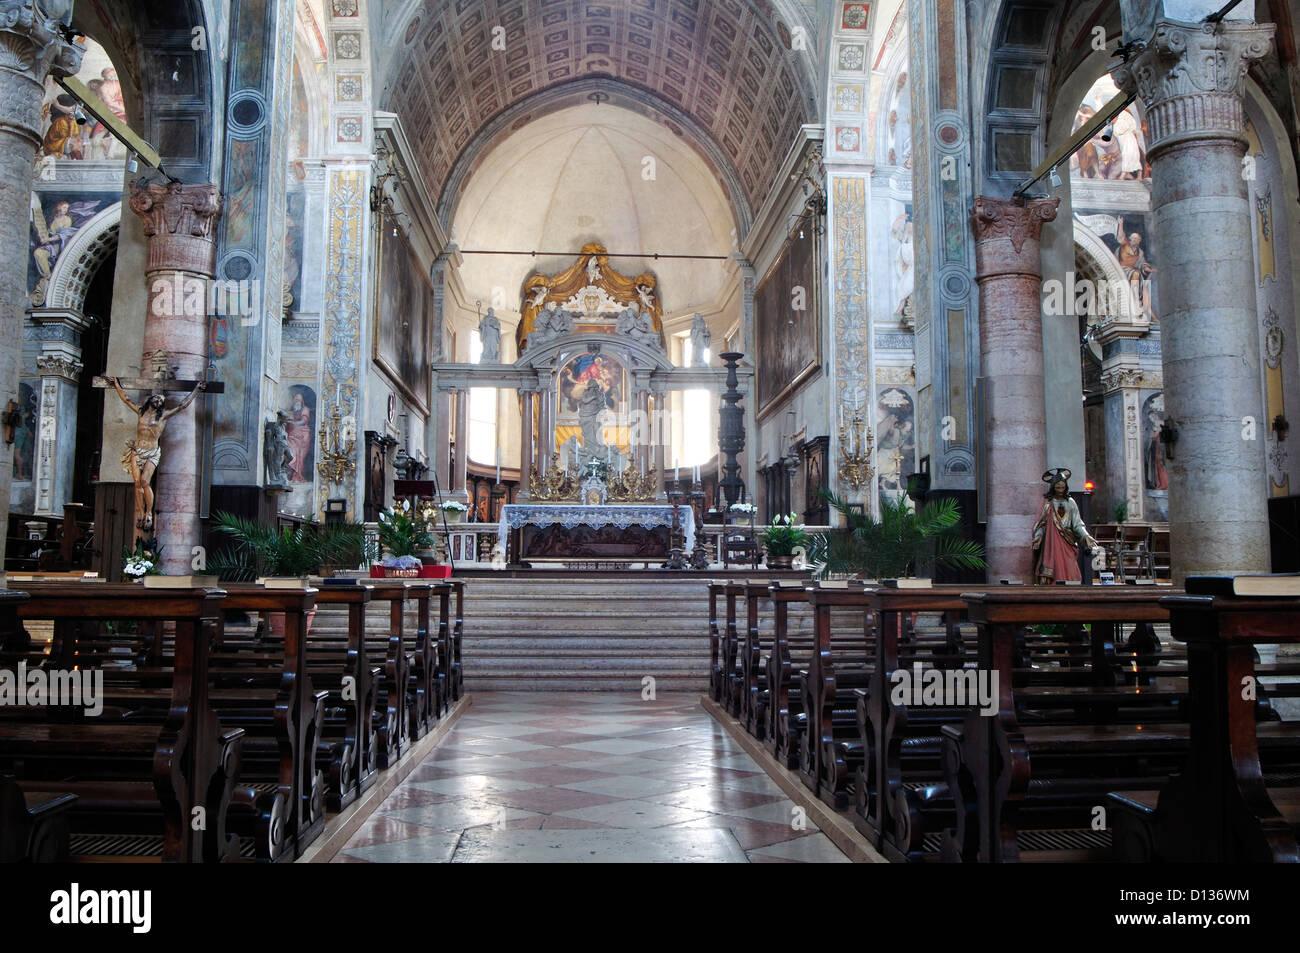 Italia, Venecia, Verona, Iglesia de Santa Maria in Organo, Nave Imagen De Stock